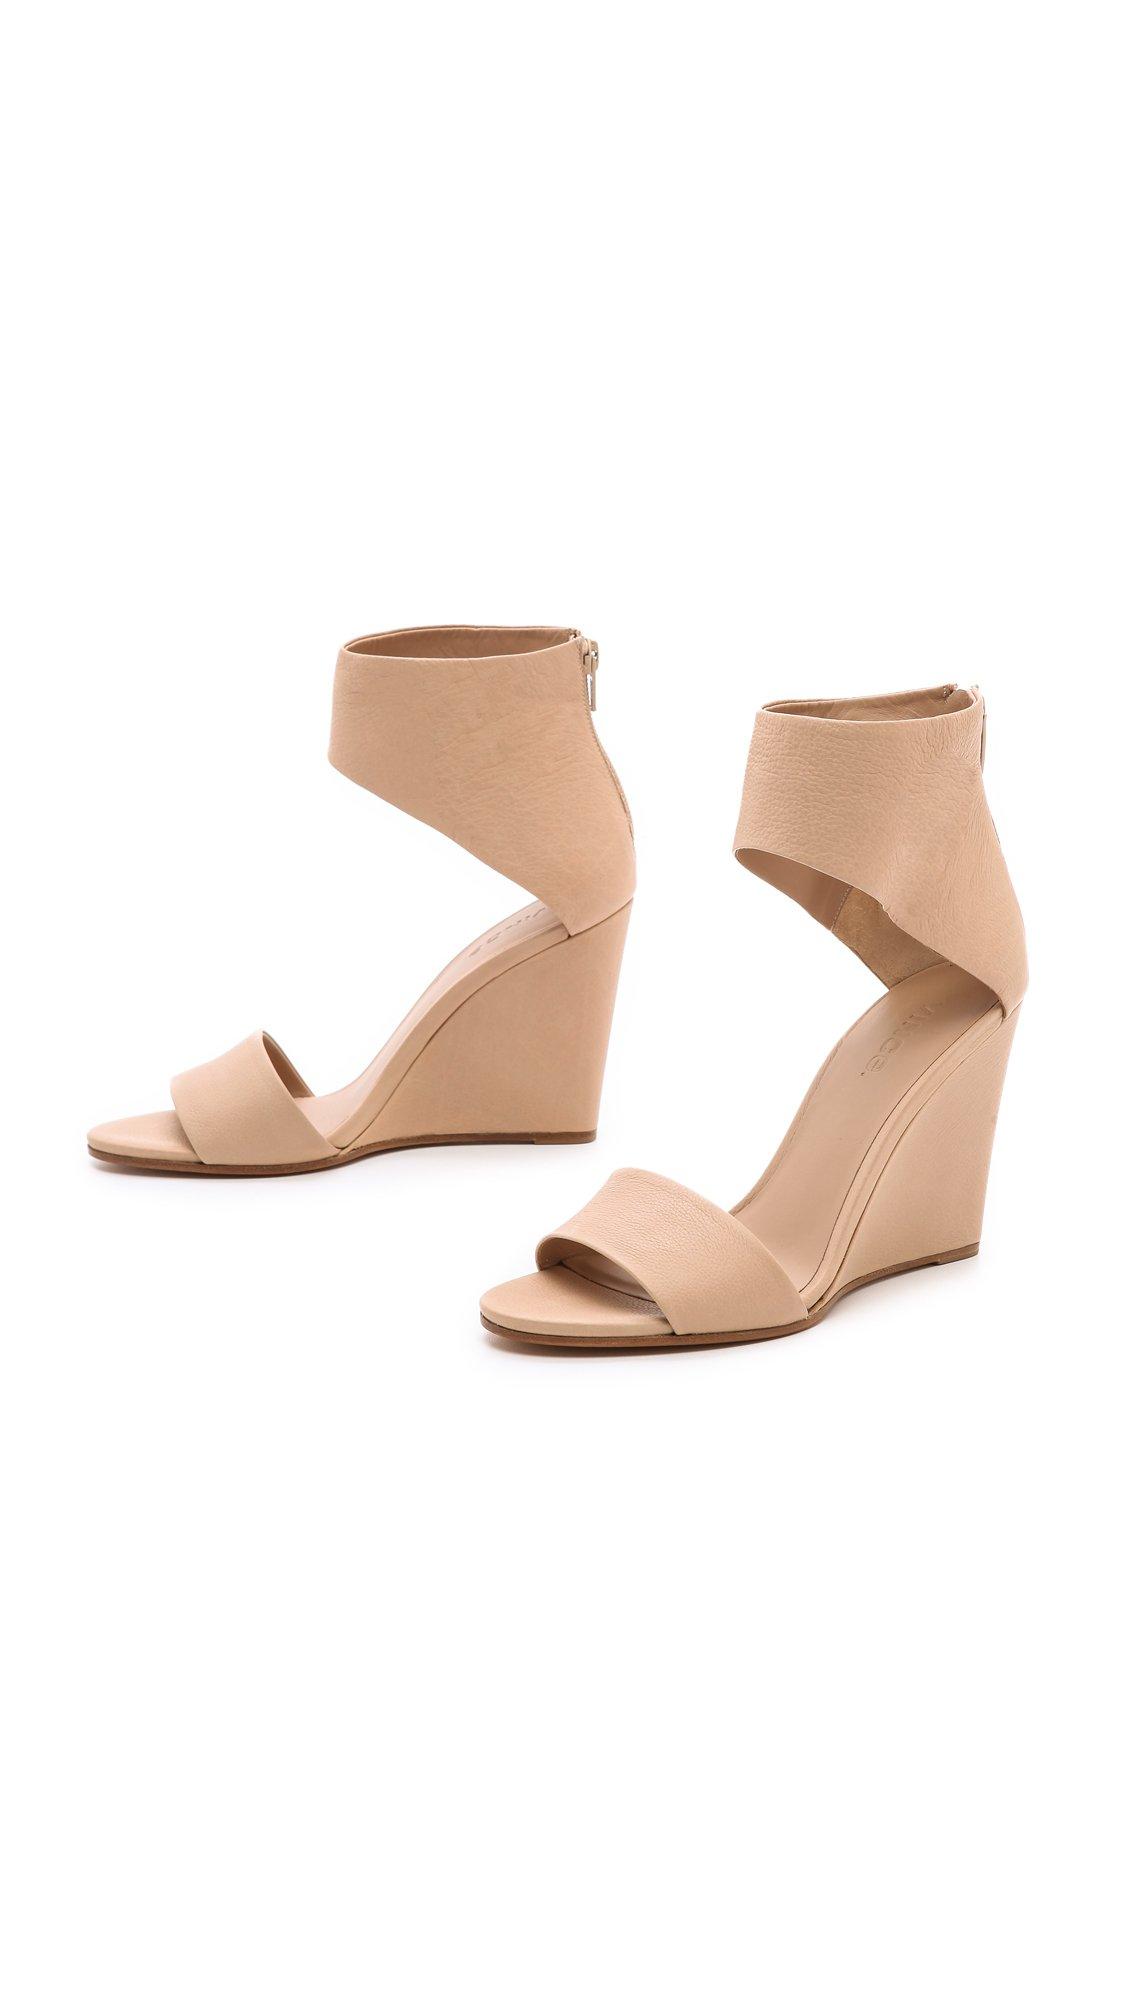 7d44e194c Lyst - Vince Kelan Wedge Sandals in Natural